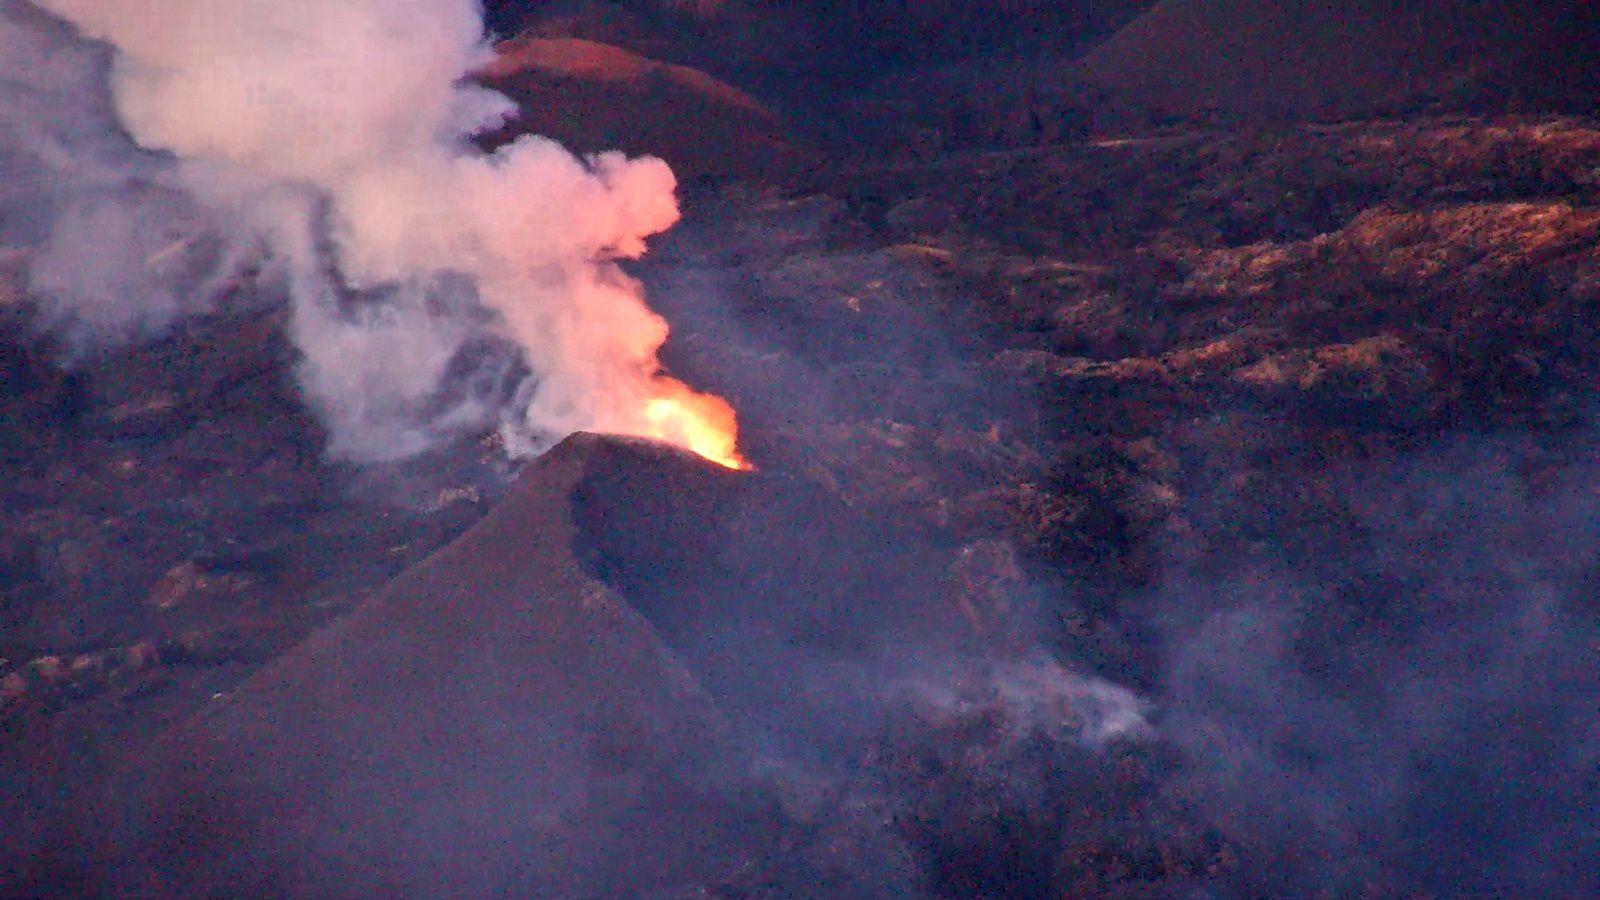 Piton de La Fournaise - the eruptive site this 5 October 2018 / 18h32 -33 - webcam IRT / OVPF